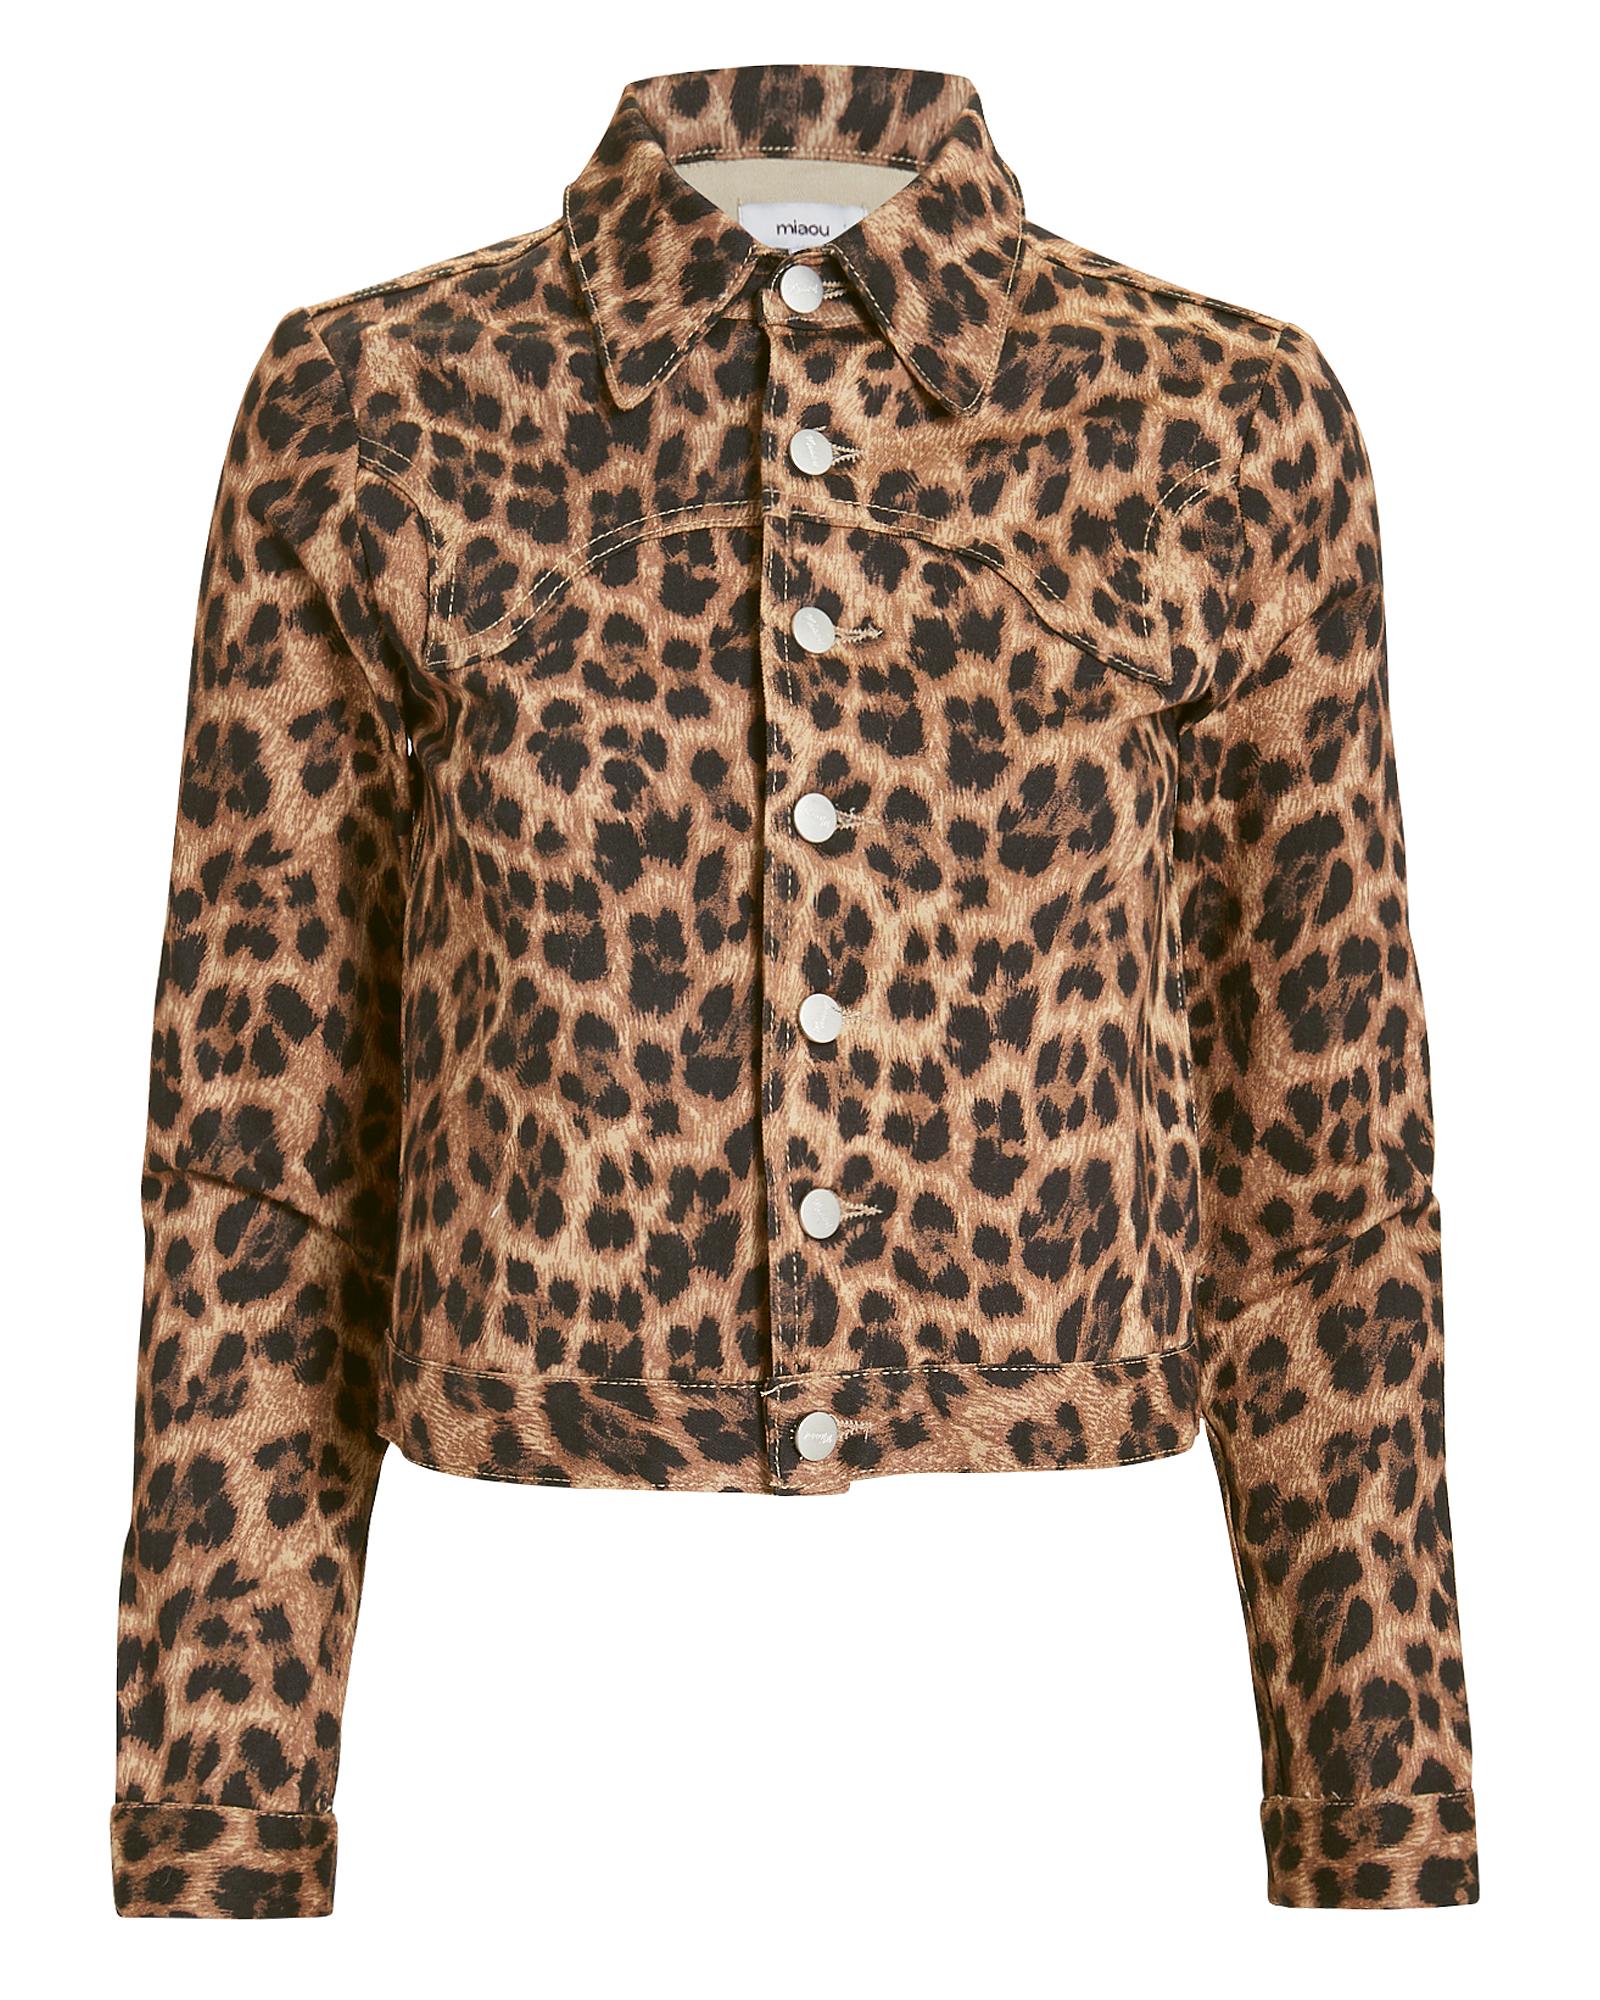 Lex Leopard Jacket